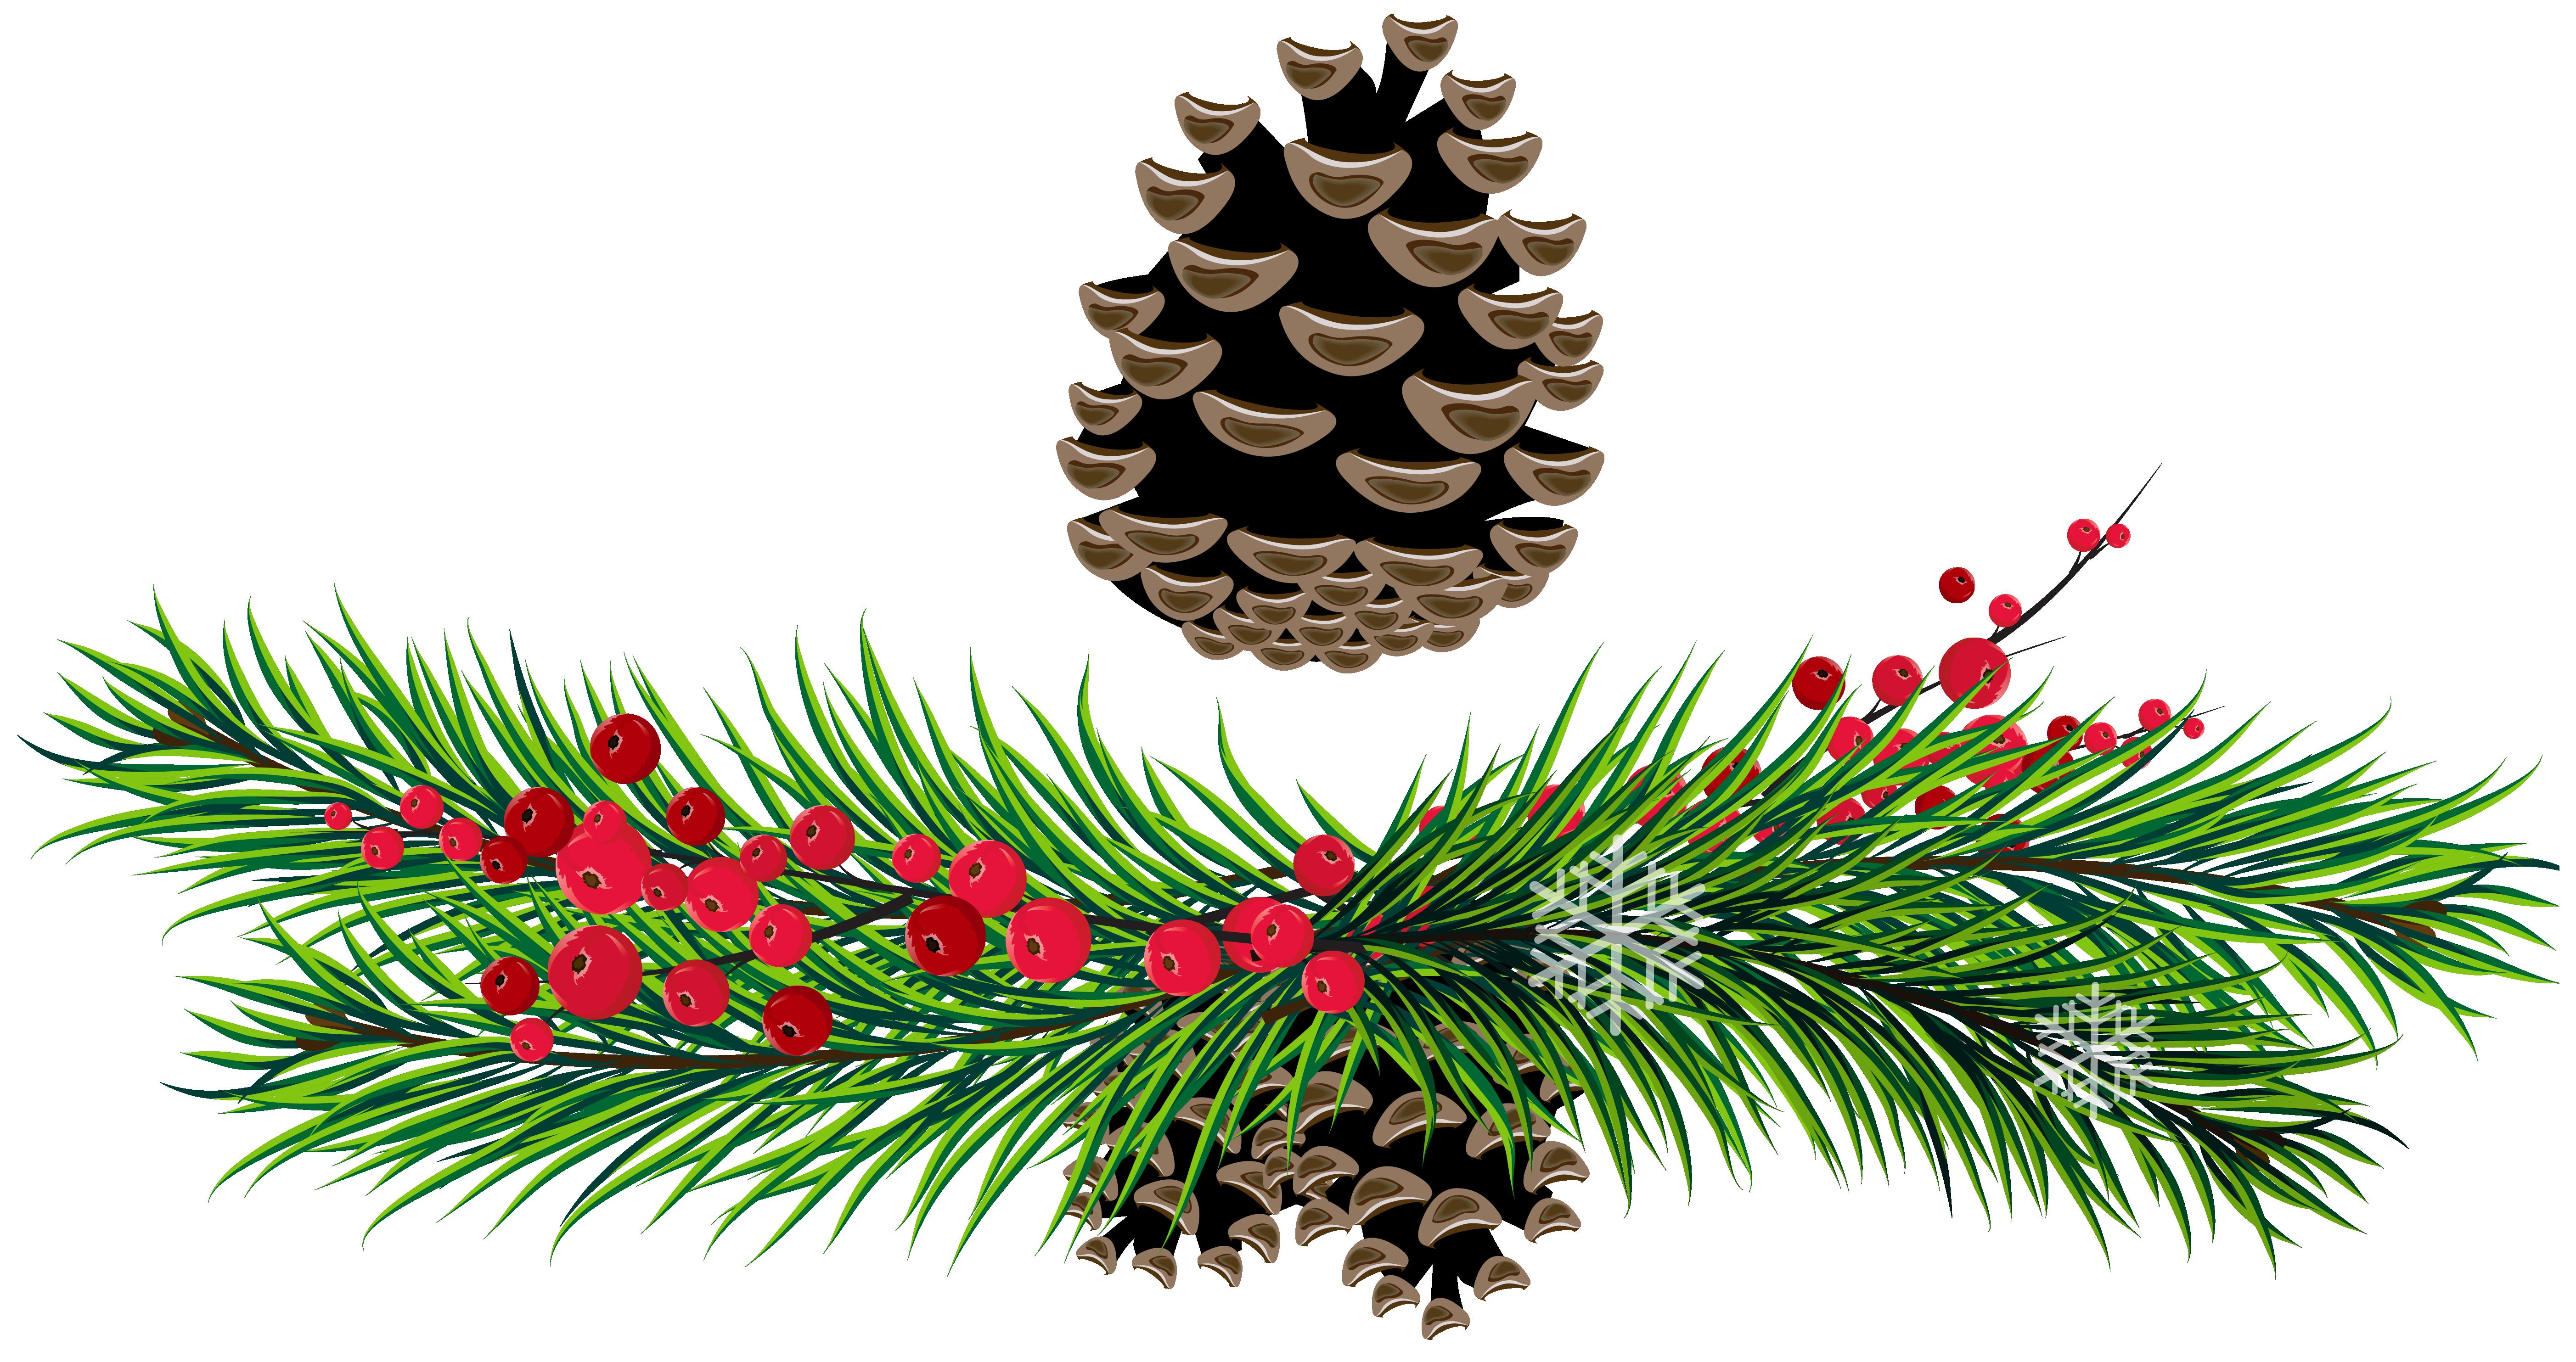 christmas pine cone drawing - photo #12